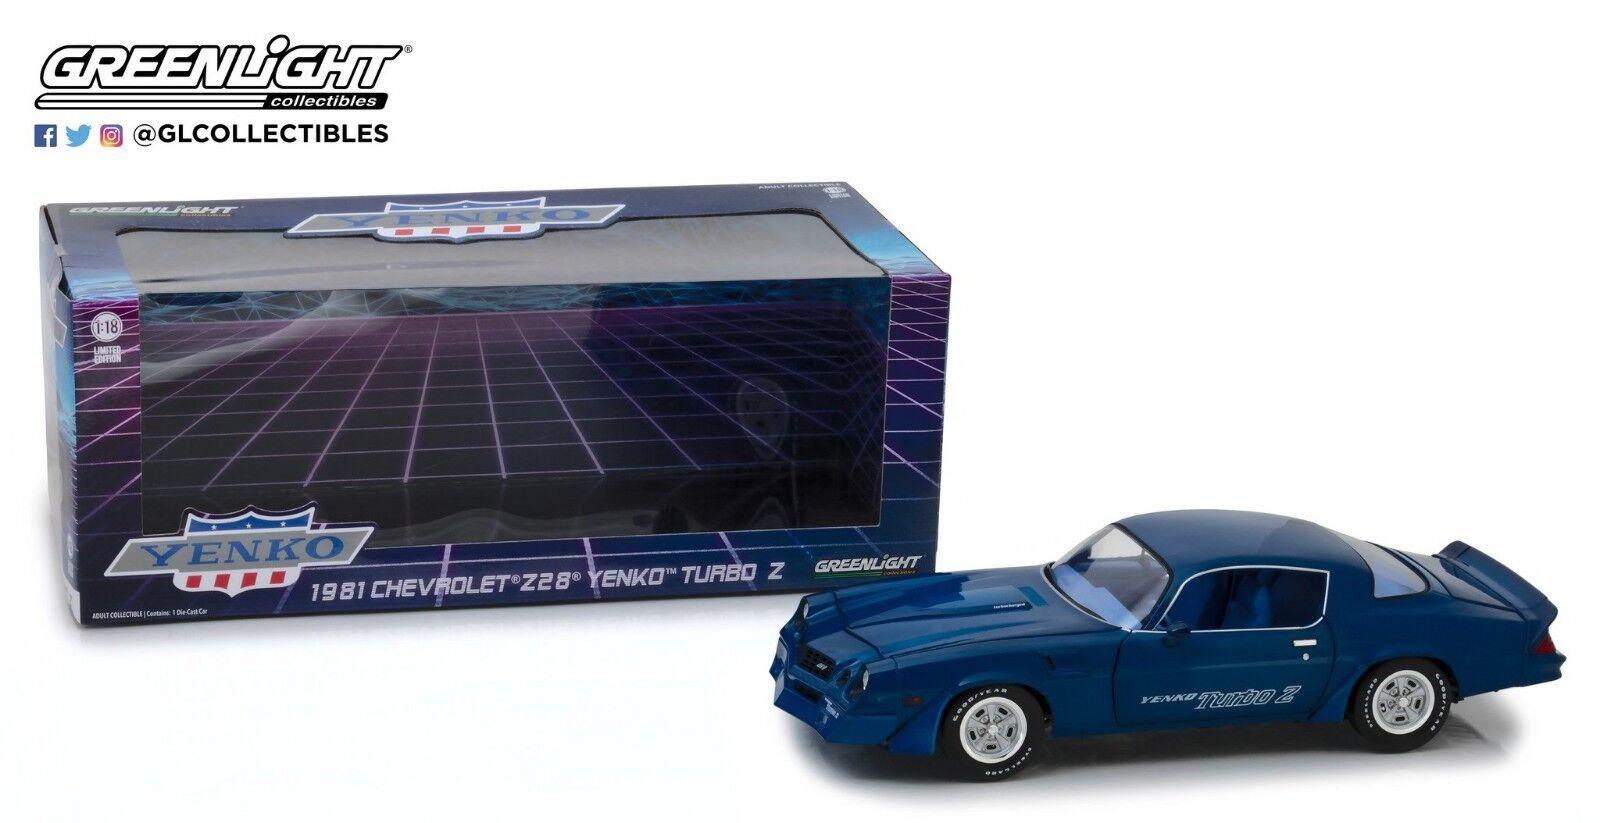 GreenLight 1 18 1981 Chevrolet Z 28 Yenko Turbo Z bluee 13520